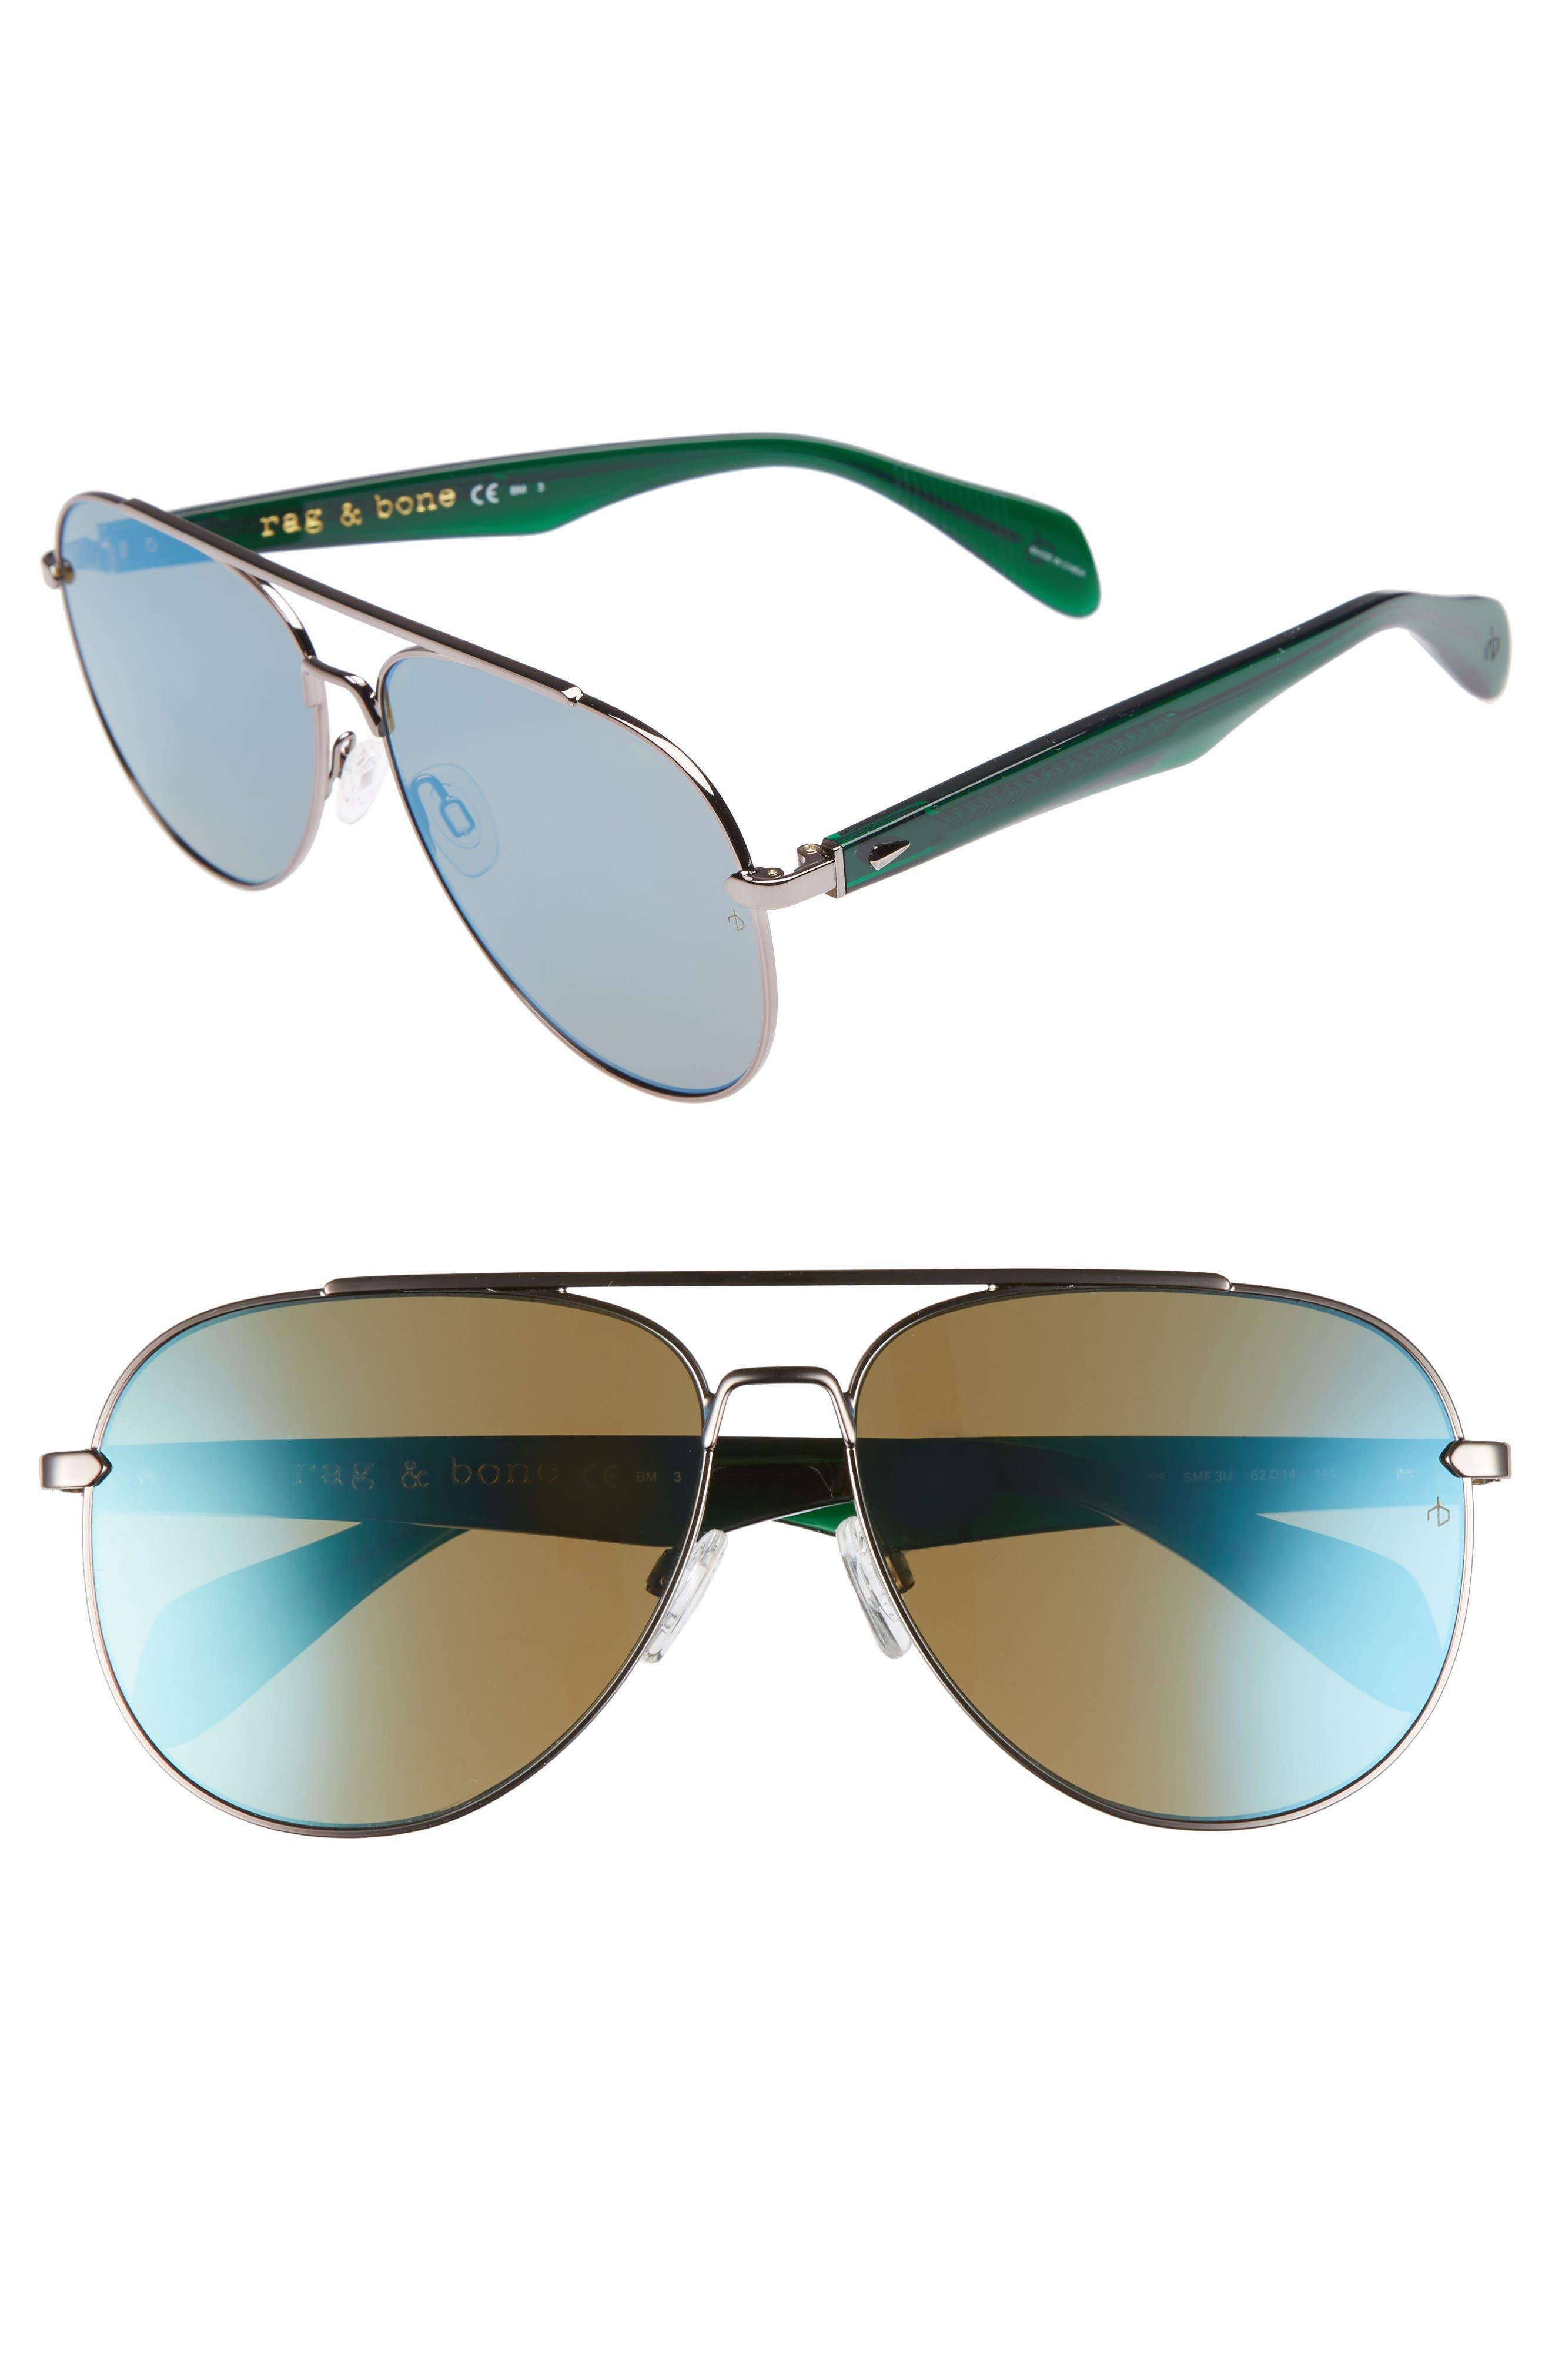 62mm Mirrored Aviator Sunglasses,                             Main thumbnail 1, color,                             Ruthenium Khaki/ Blue